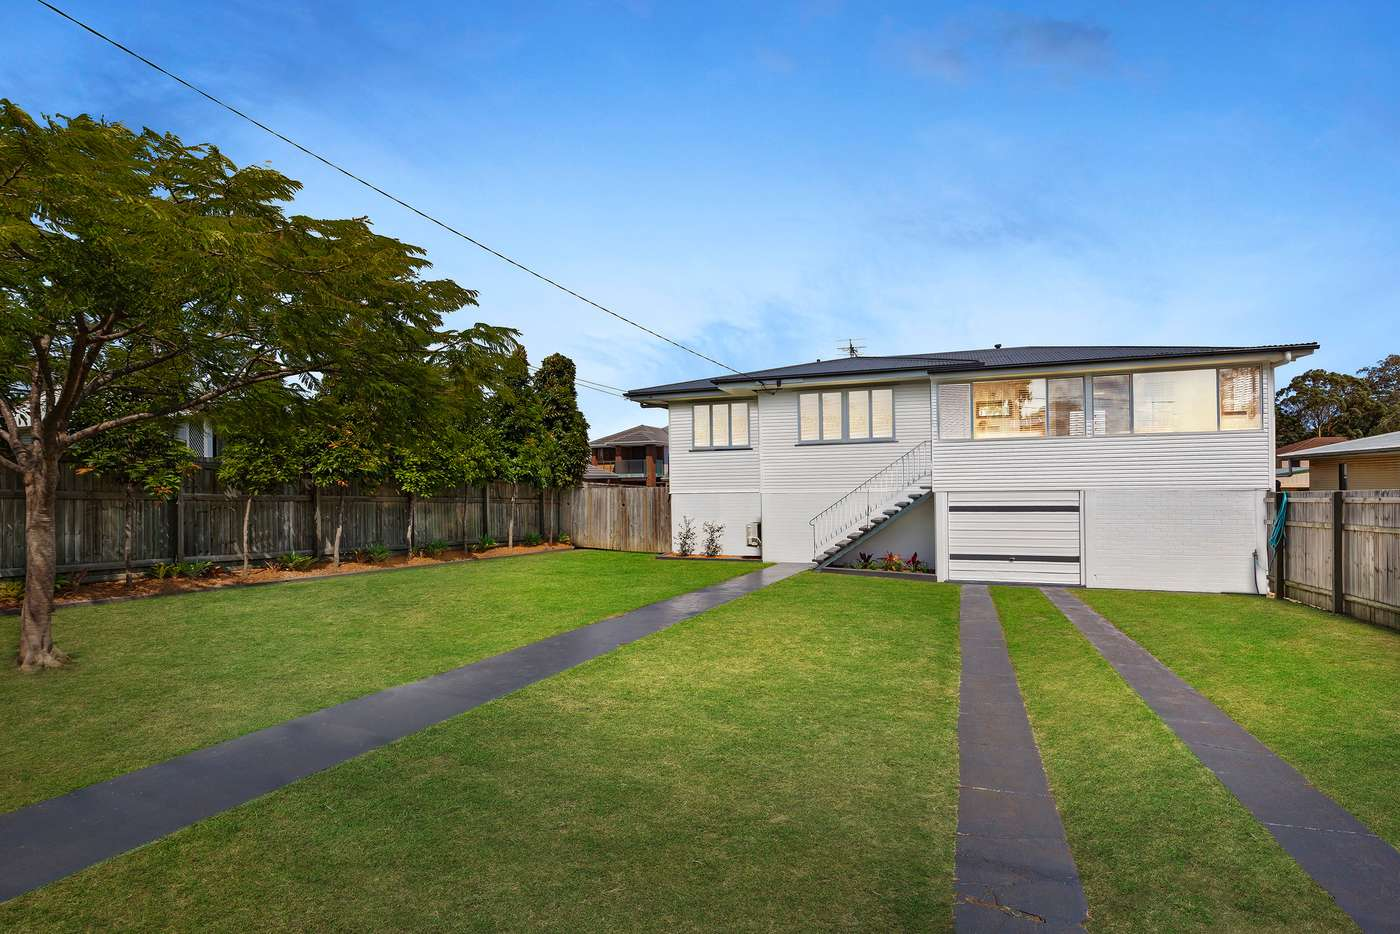 Main view of Homely house listing, 68 Hamilton Street, Tingalpa QLD 4173